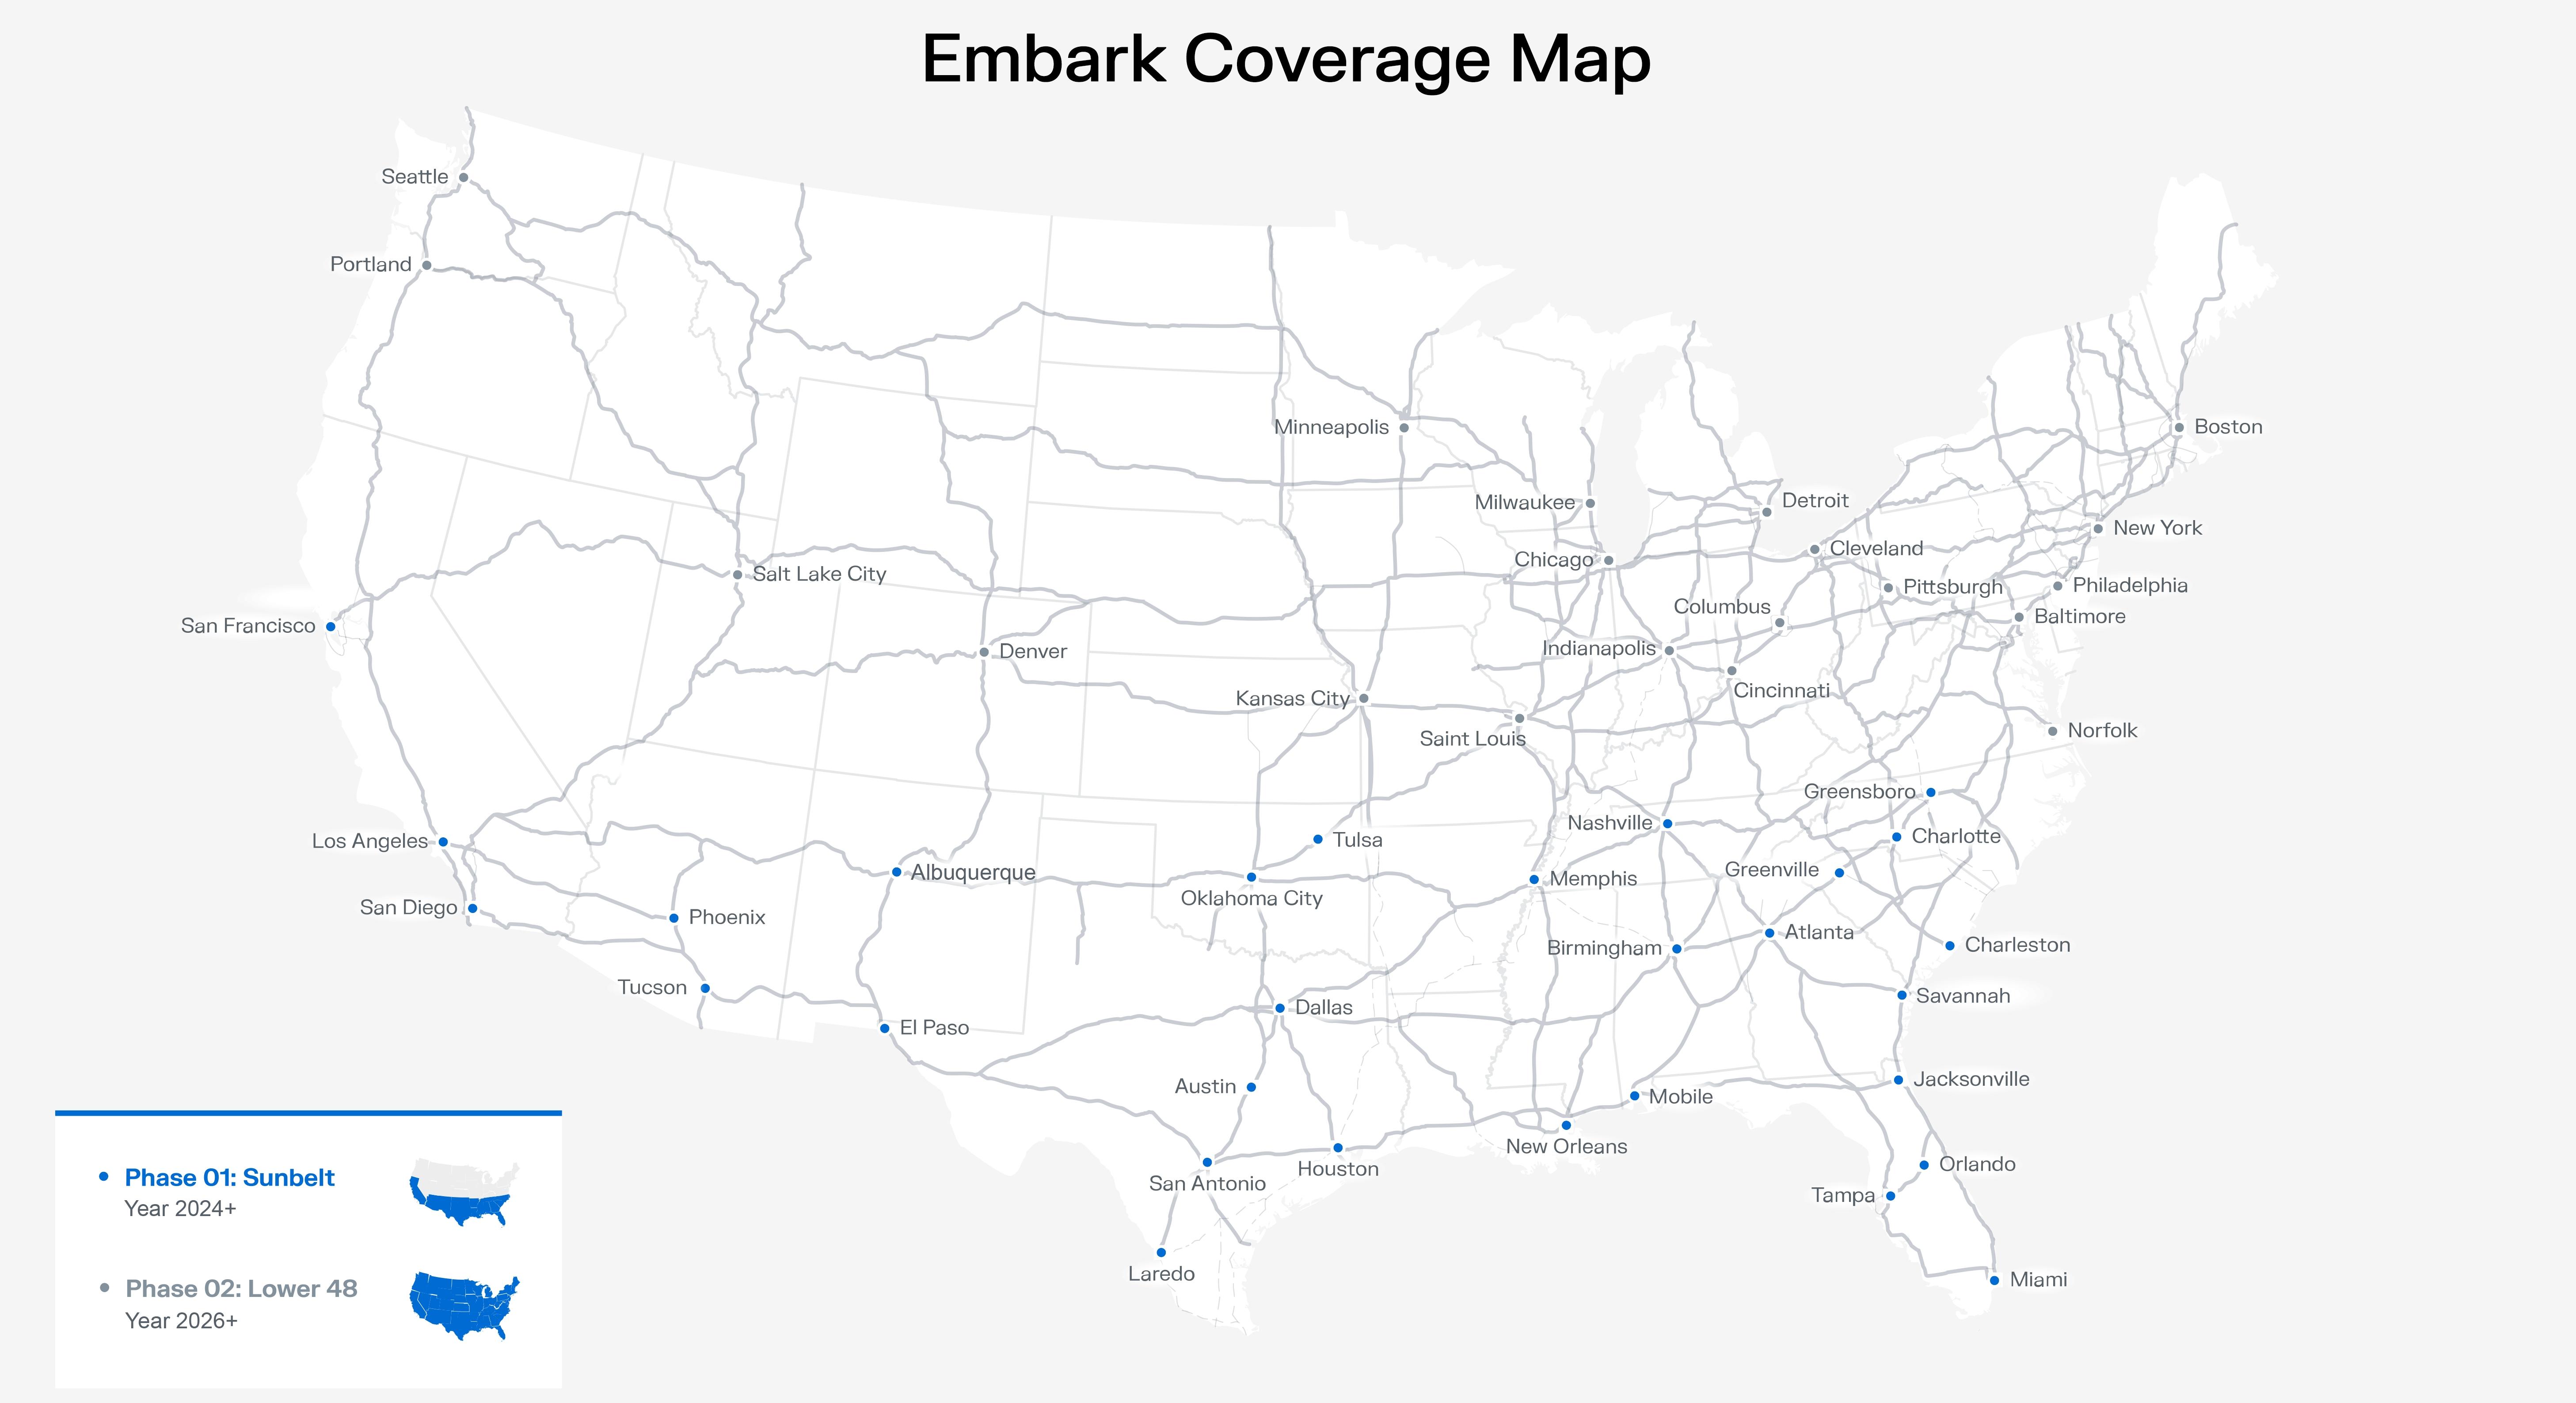 Ryder to build logistics network with autonomous trucking company Embark